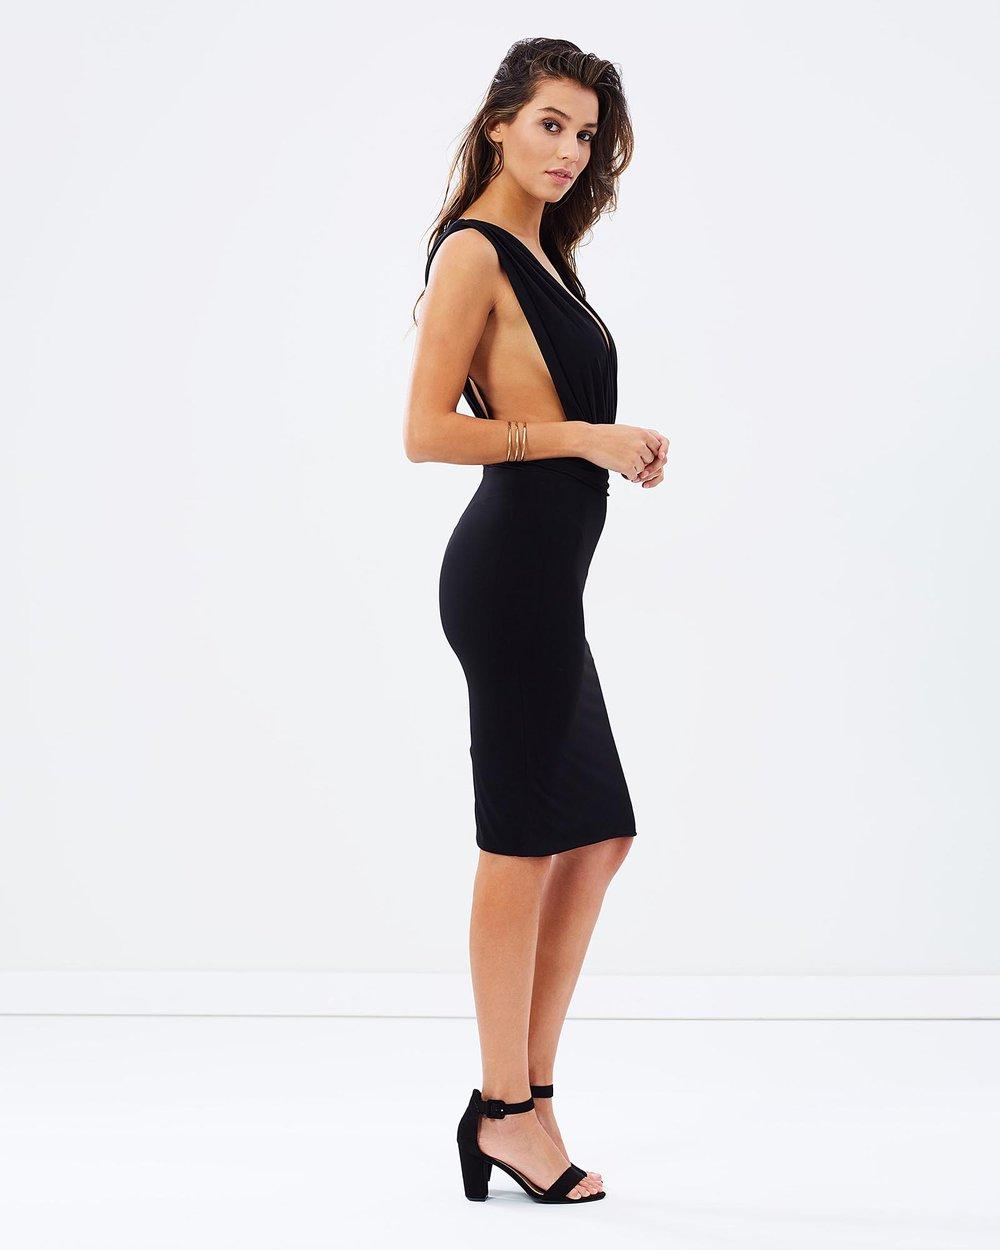 178b2b3c1ec Deep V Cocktail Dress by SKIVA Online